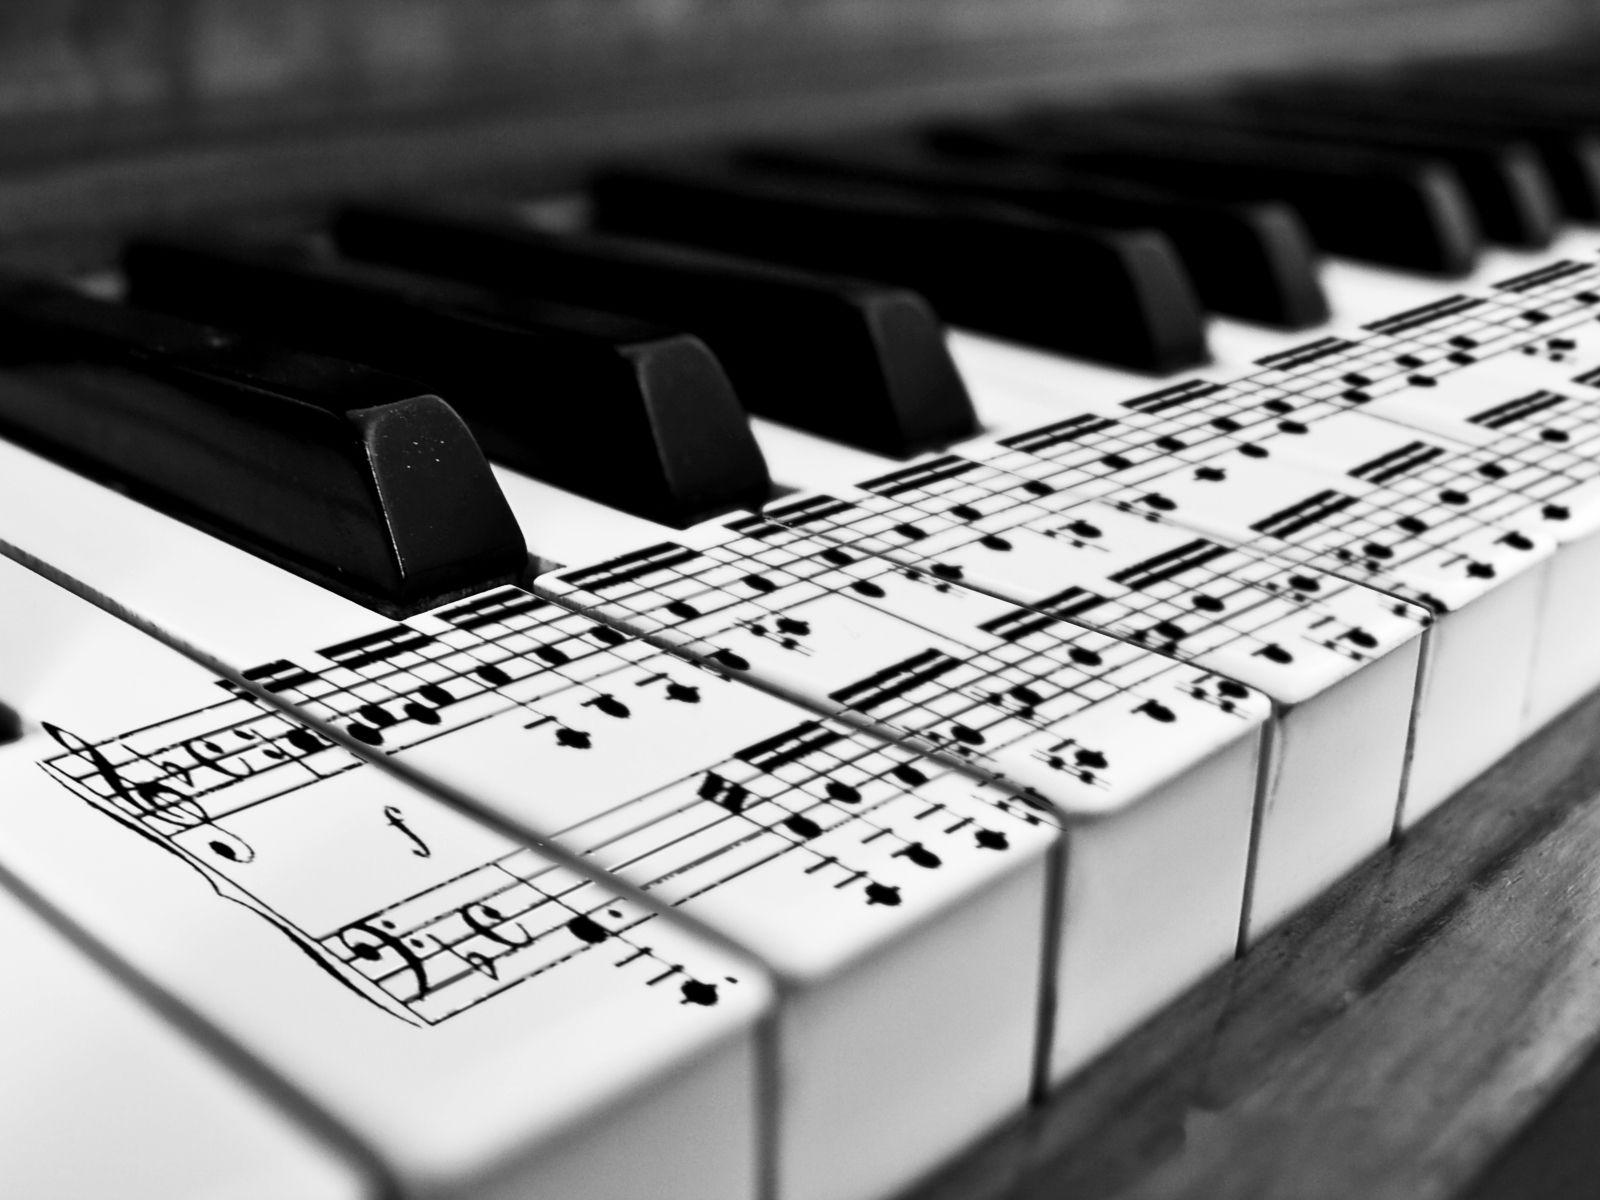 sheet music piano wallpaper hd desktop background #2833434 wallpaper